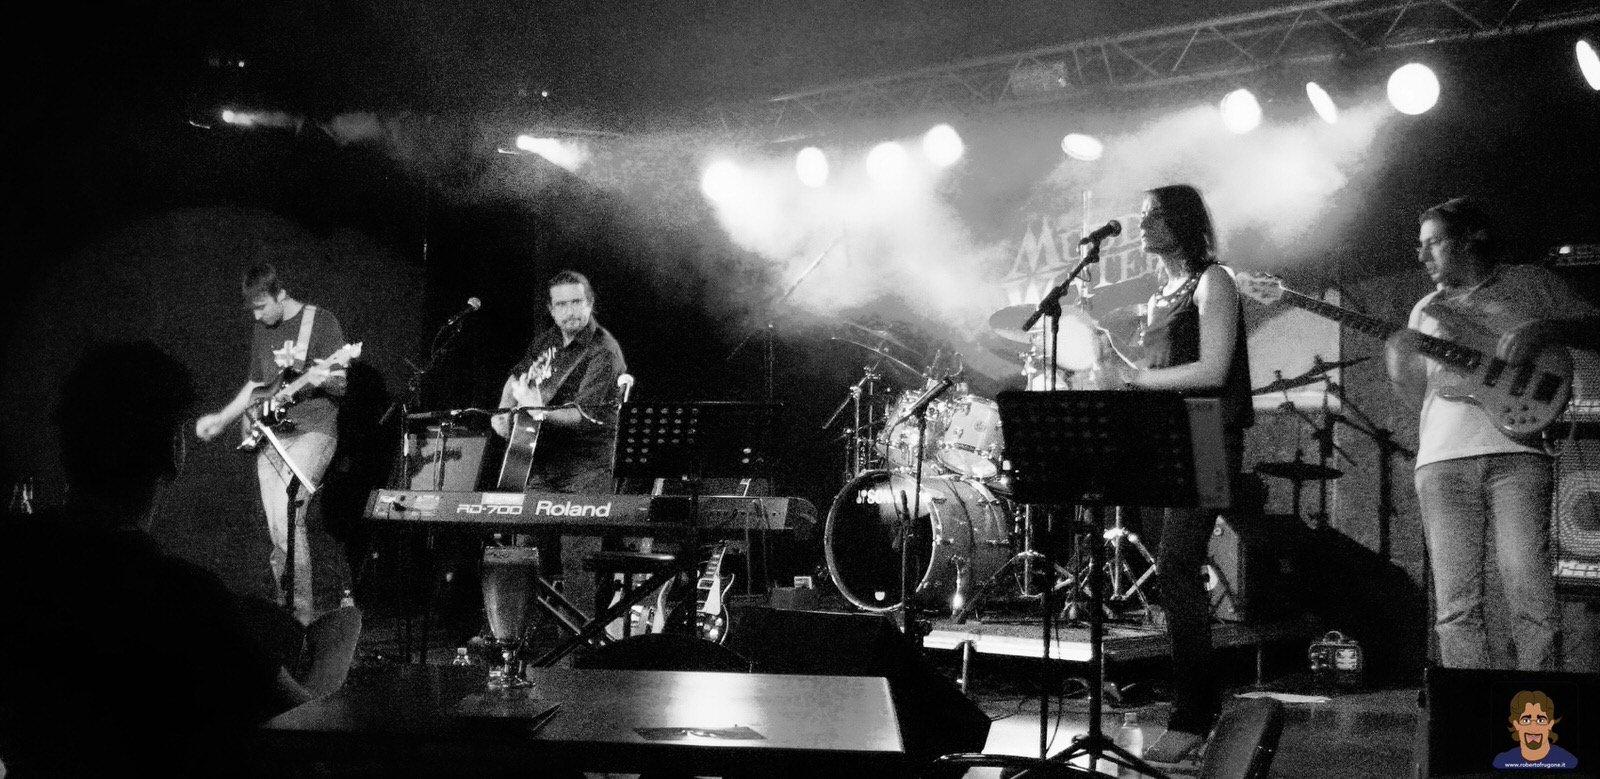 Roberto Frugone Band cantautore live concerto Calvari Muddy Waters 01